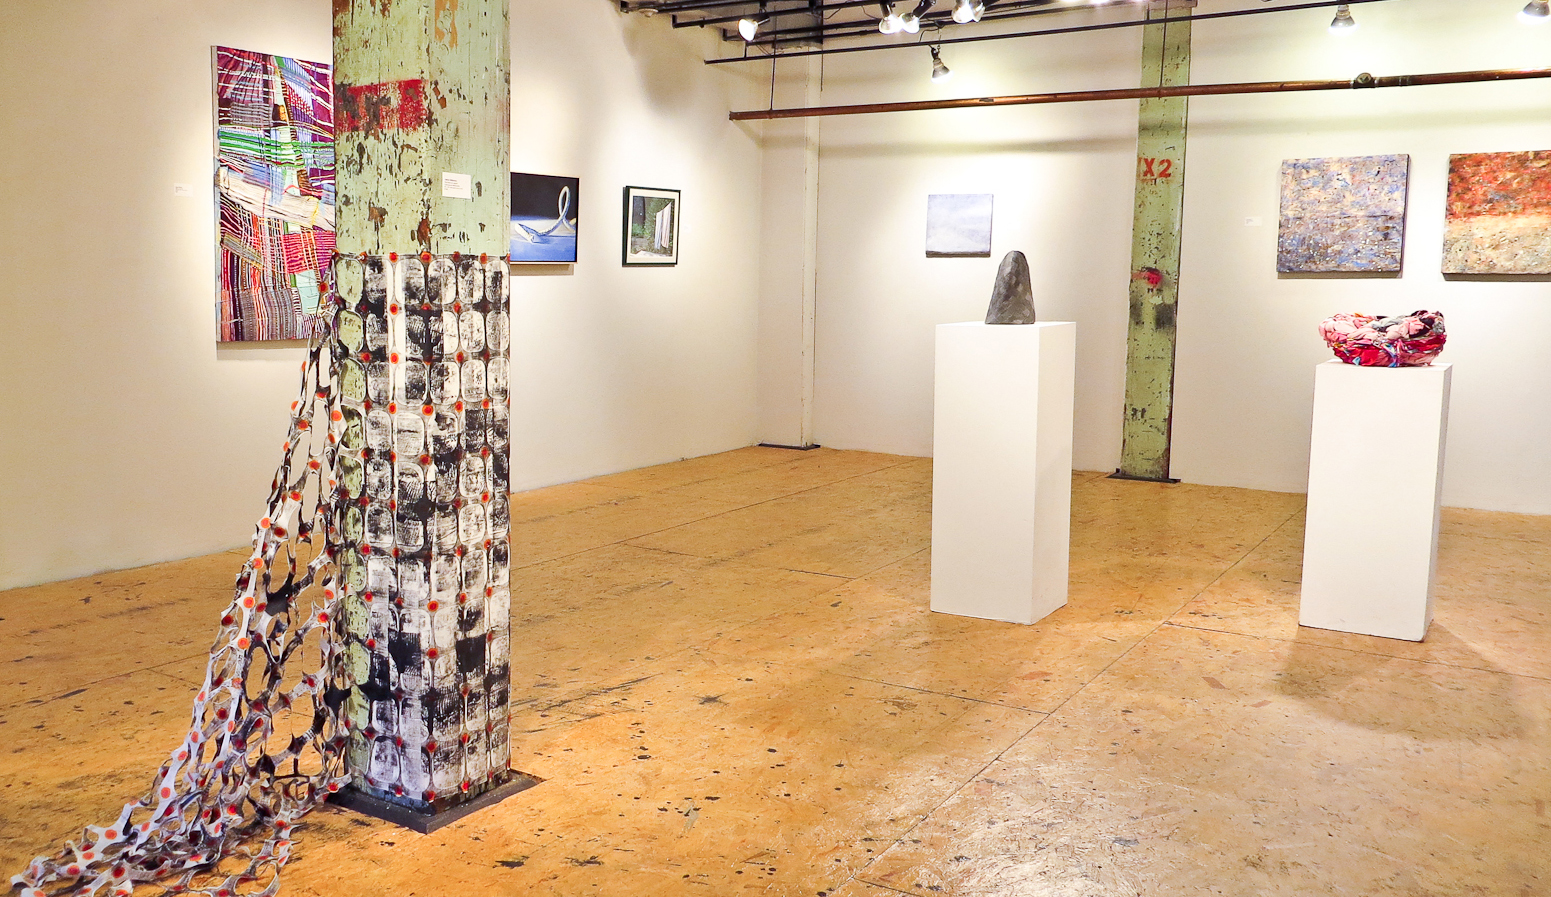 joanne mattera art blog critical mass cotton at fountain installation view clockwise jeanne williamson shown in essay stacey piwinsky roy perkinson david hawkins both shown in essay cheryl clinton